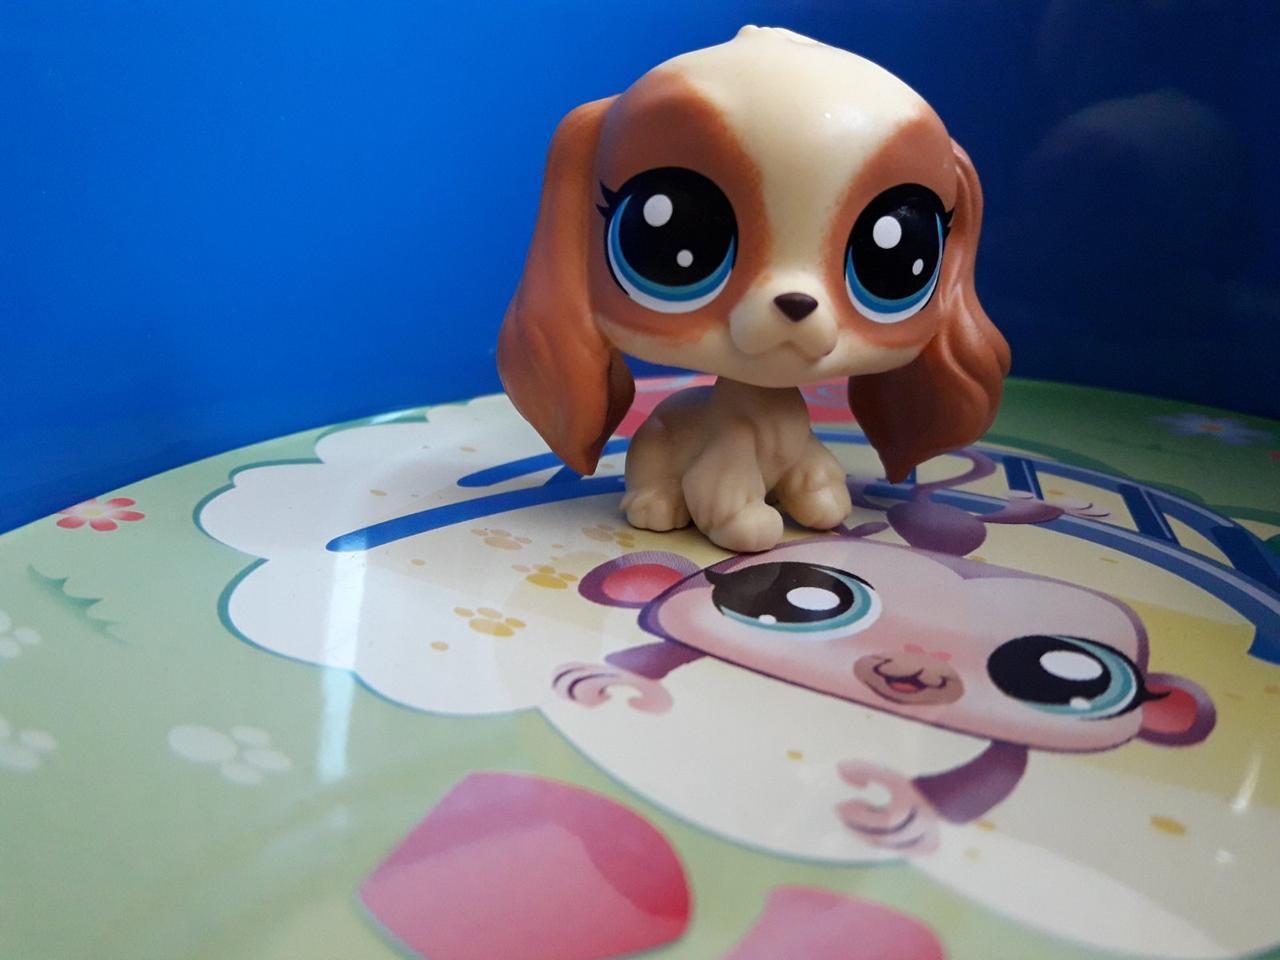 Littlest pet shop lps игрушка Hasbro лпс пет шоп собачка danielle spanielle